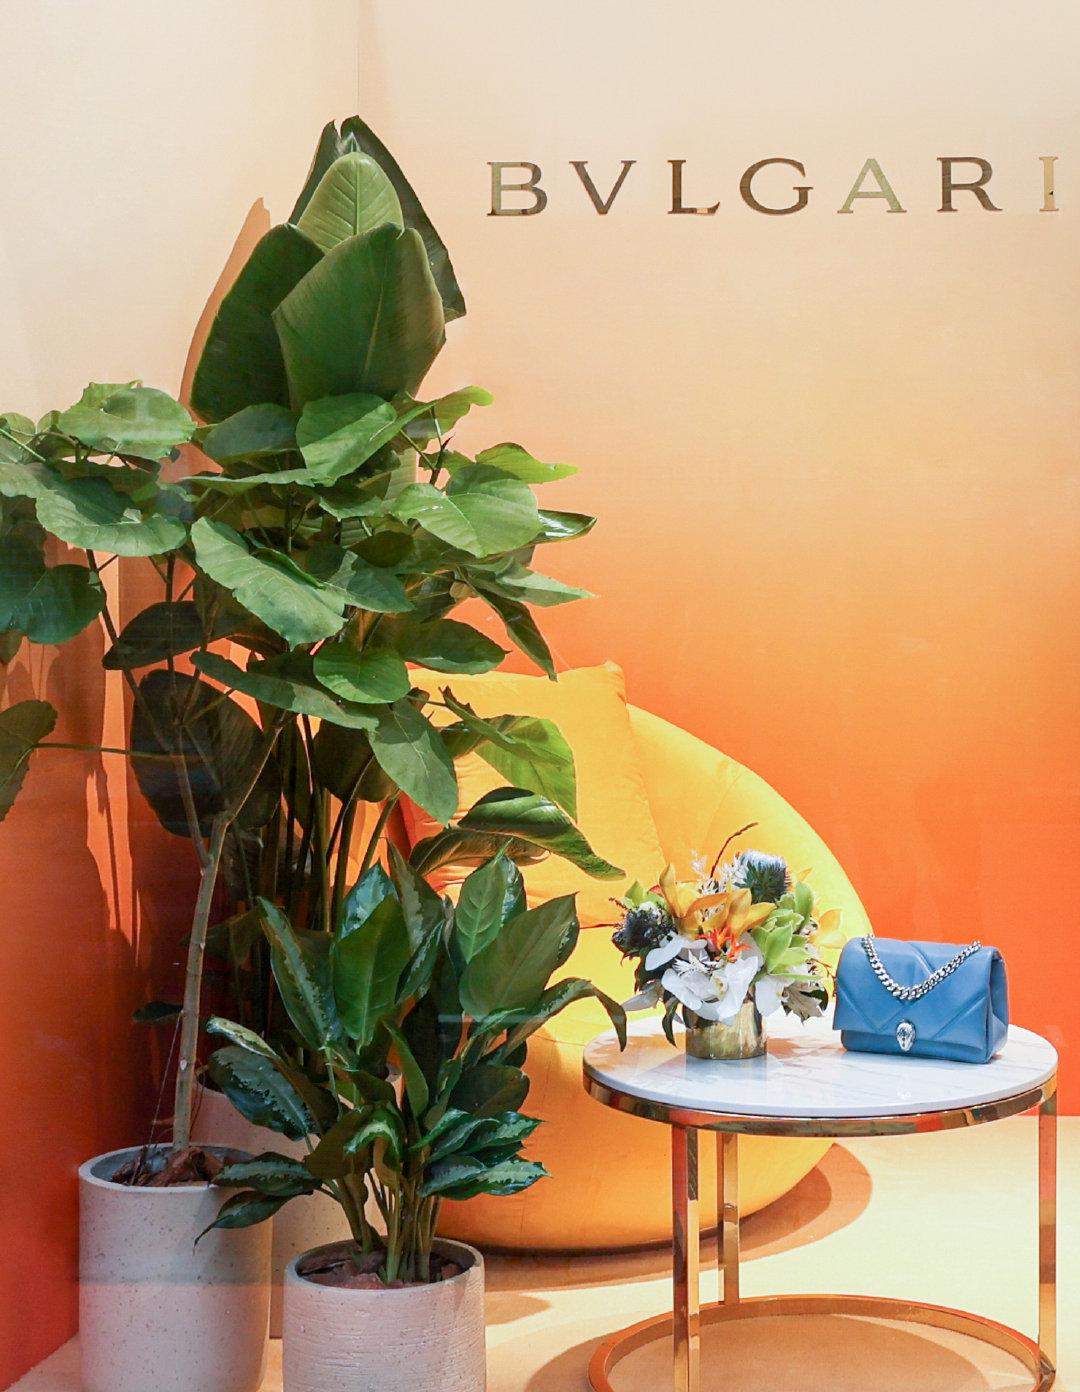 BVLGARI宝格丽2022春夏皮具与配饰系列新品预览会落地上海